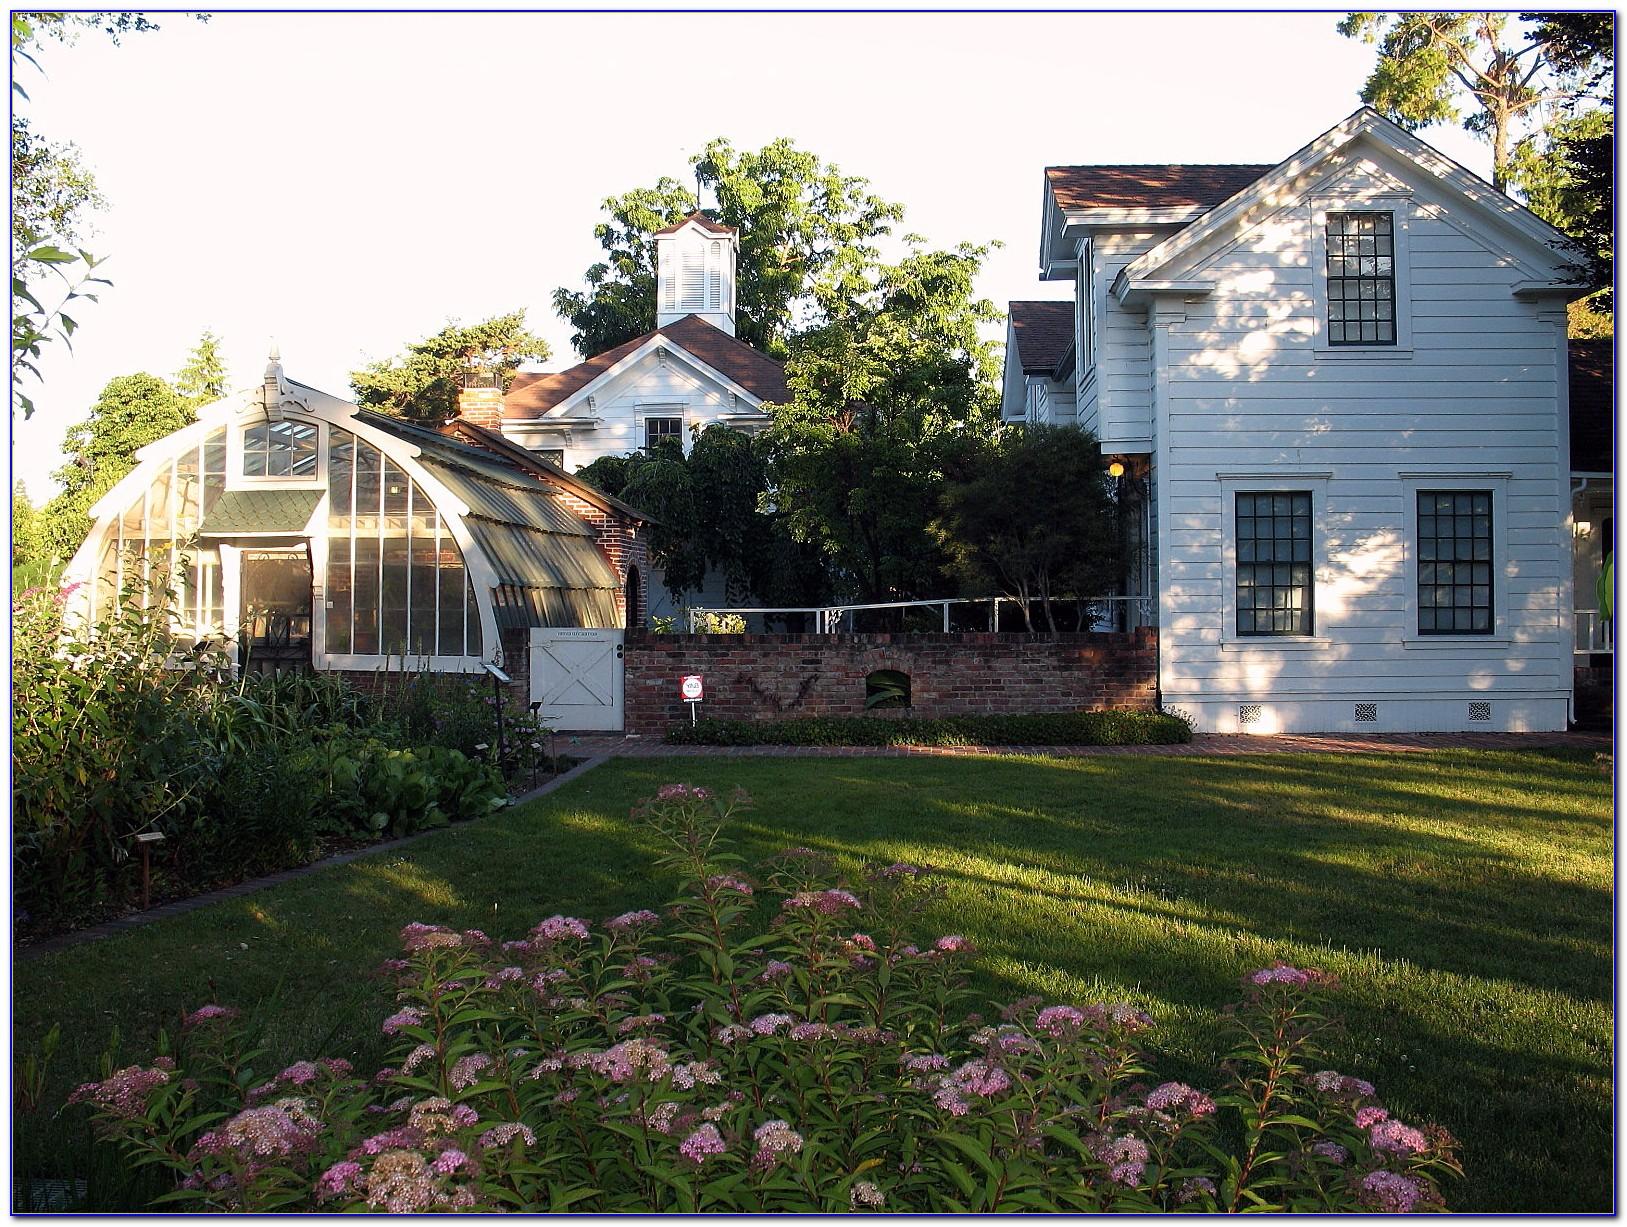 Luther burbank home and gardens wedding garden home design ideas 2md9qnodoj53623 for Luther burbank home and gardens